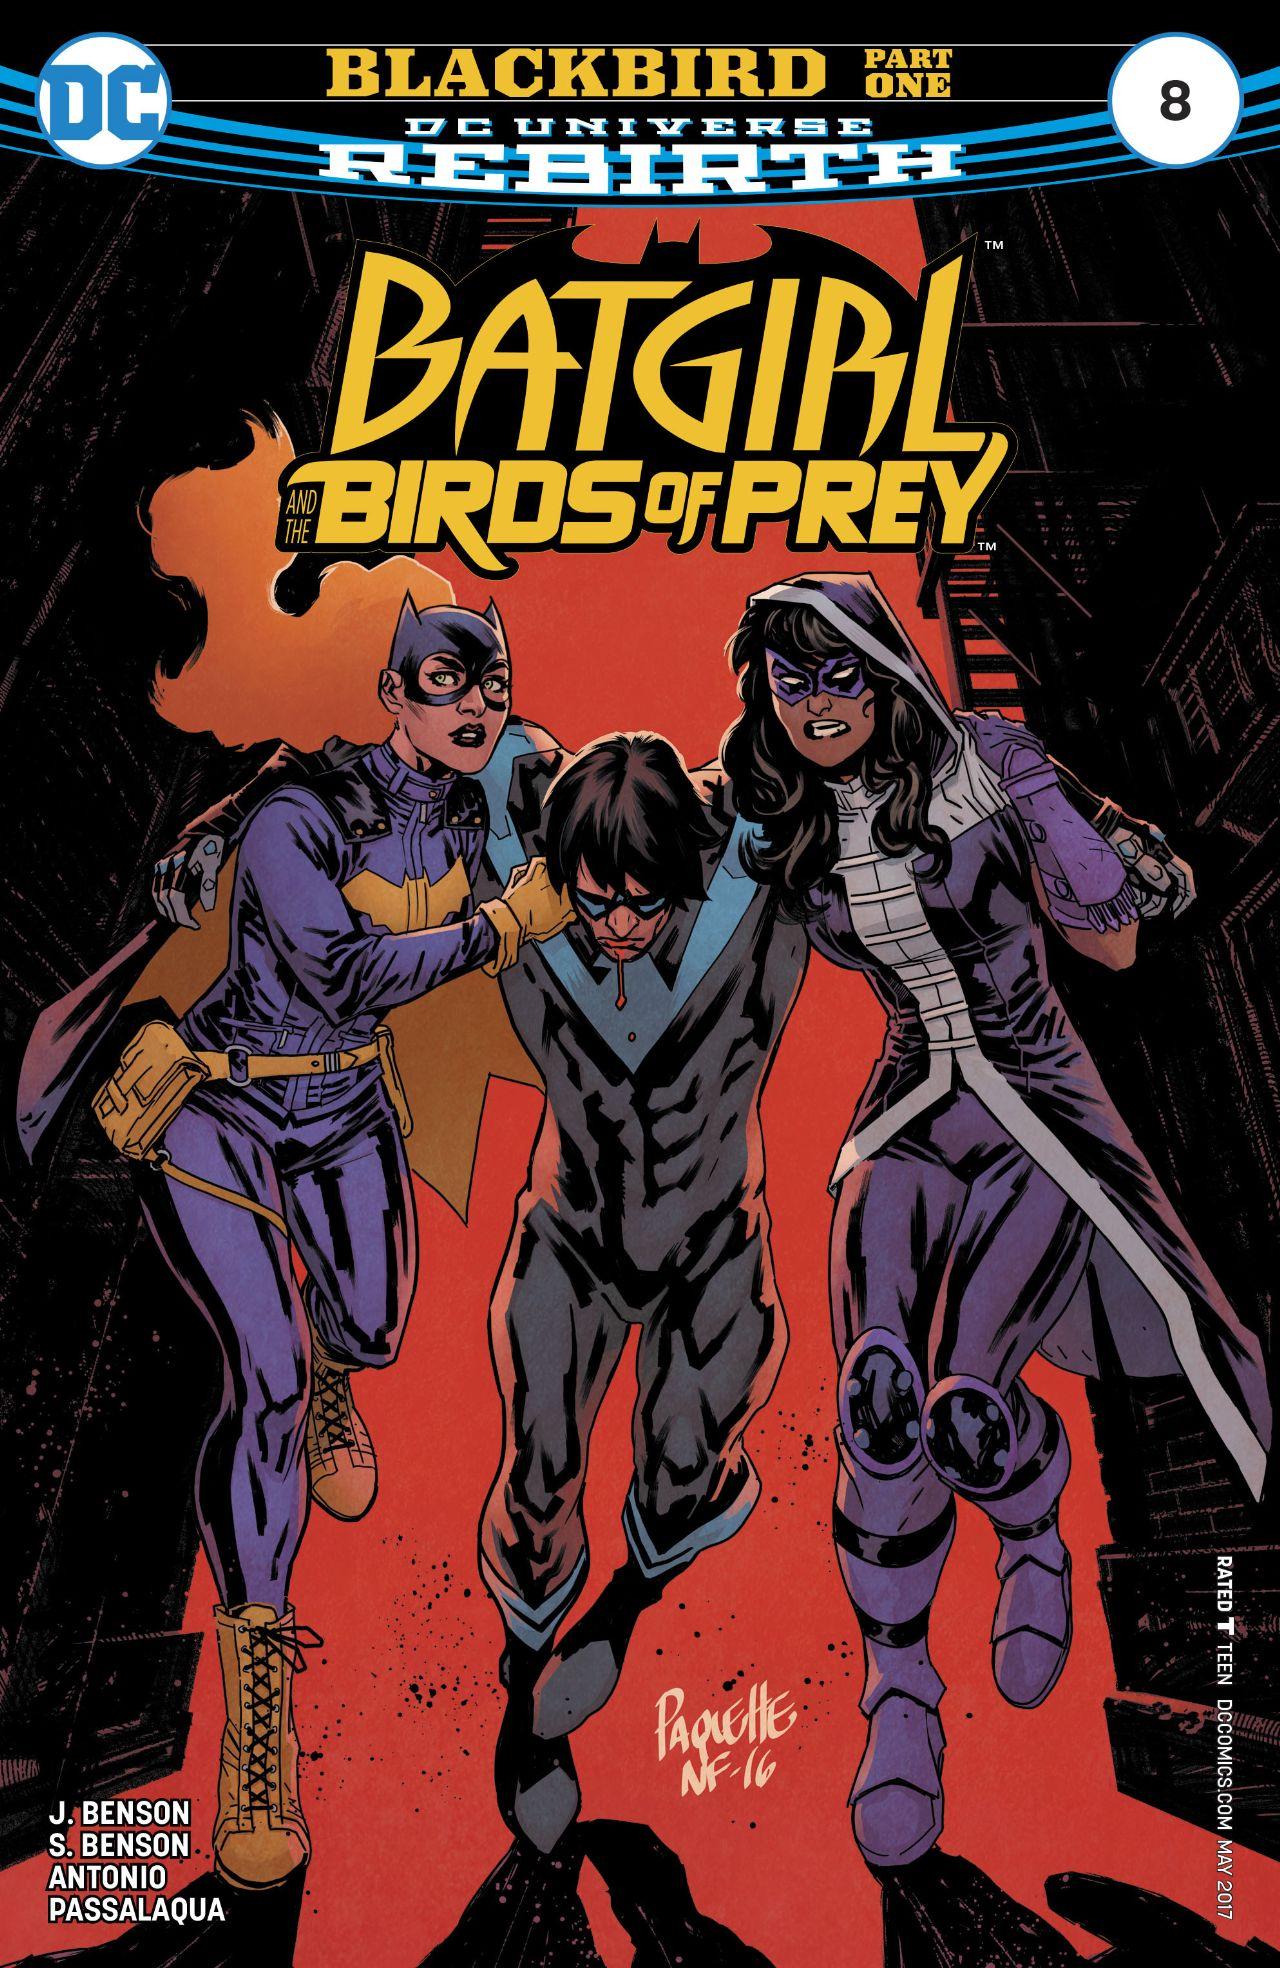 Batgirl and the Birds of Prey Vol 1 8 | DC Database | FANDOM